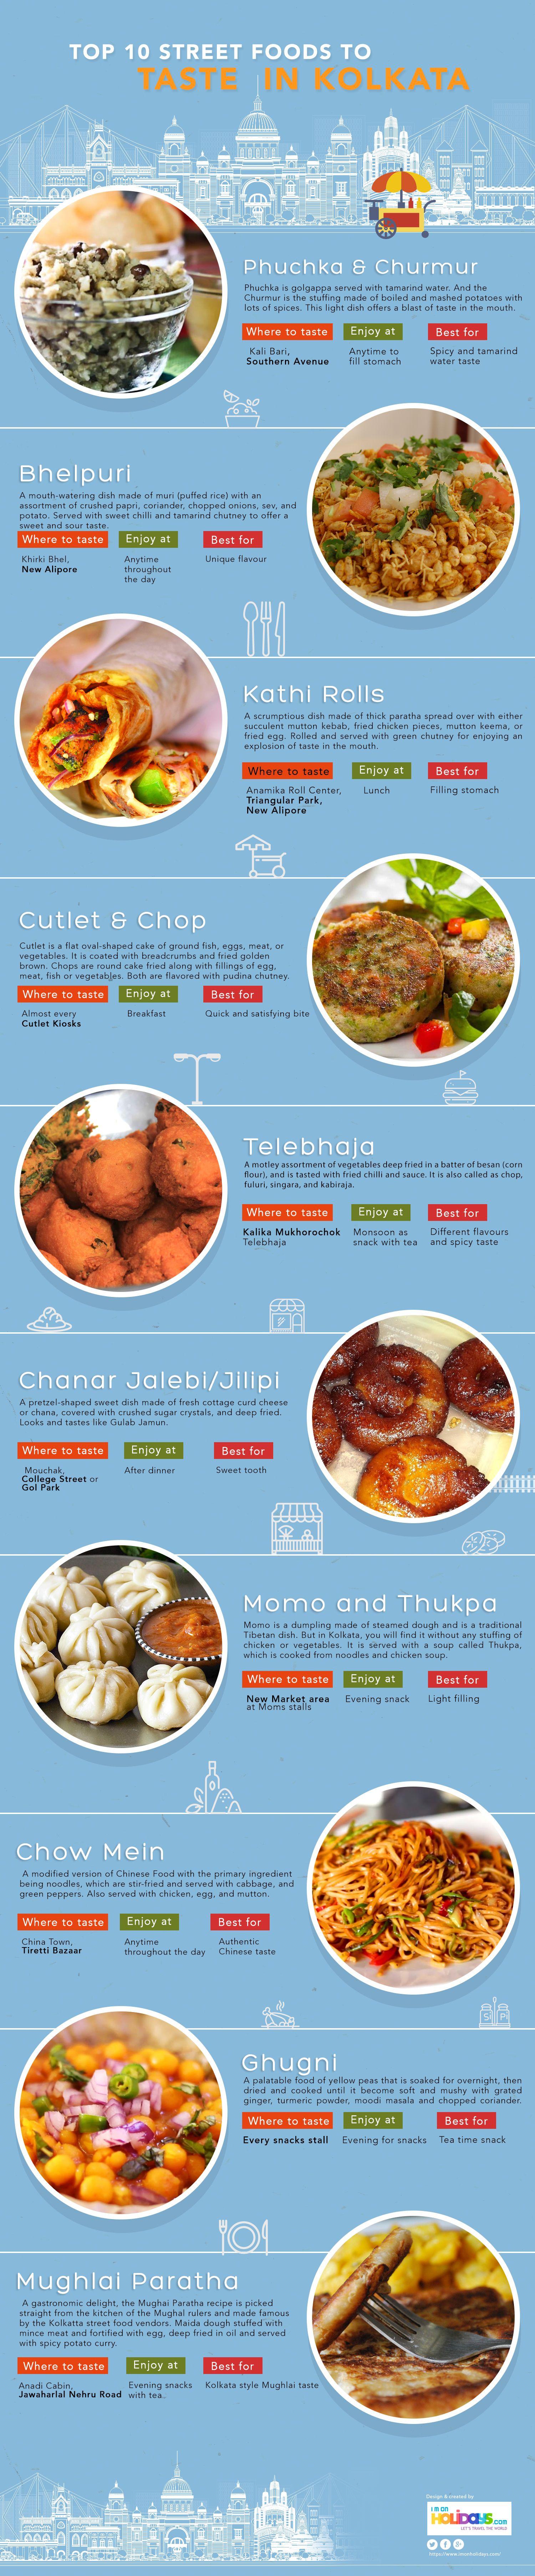 Top 10 Street Foods to Taste in Kolkata #Infographic | Pinterest ...